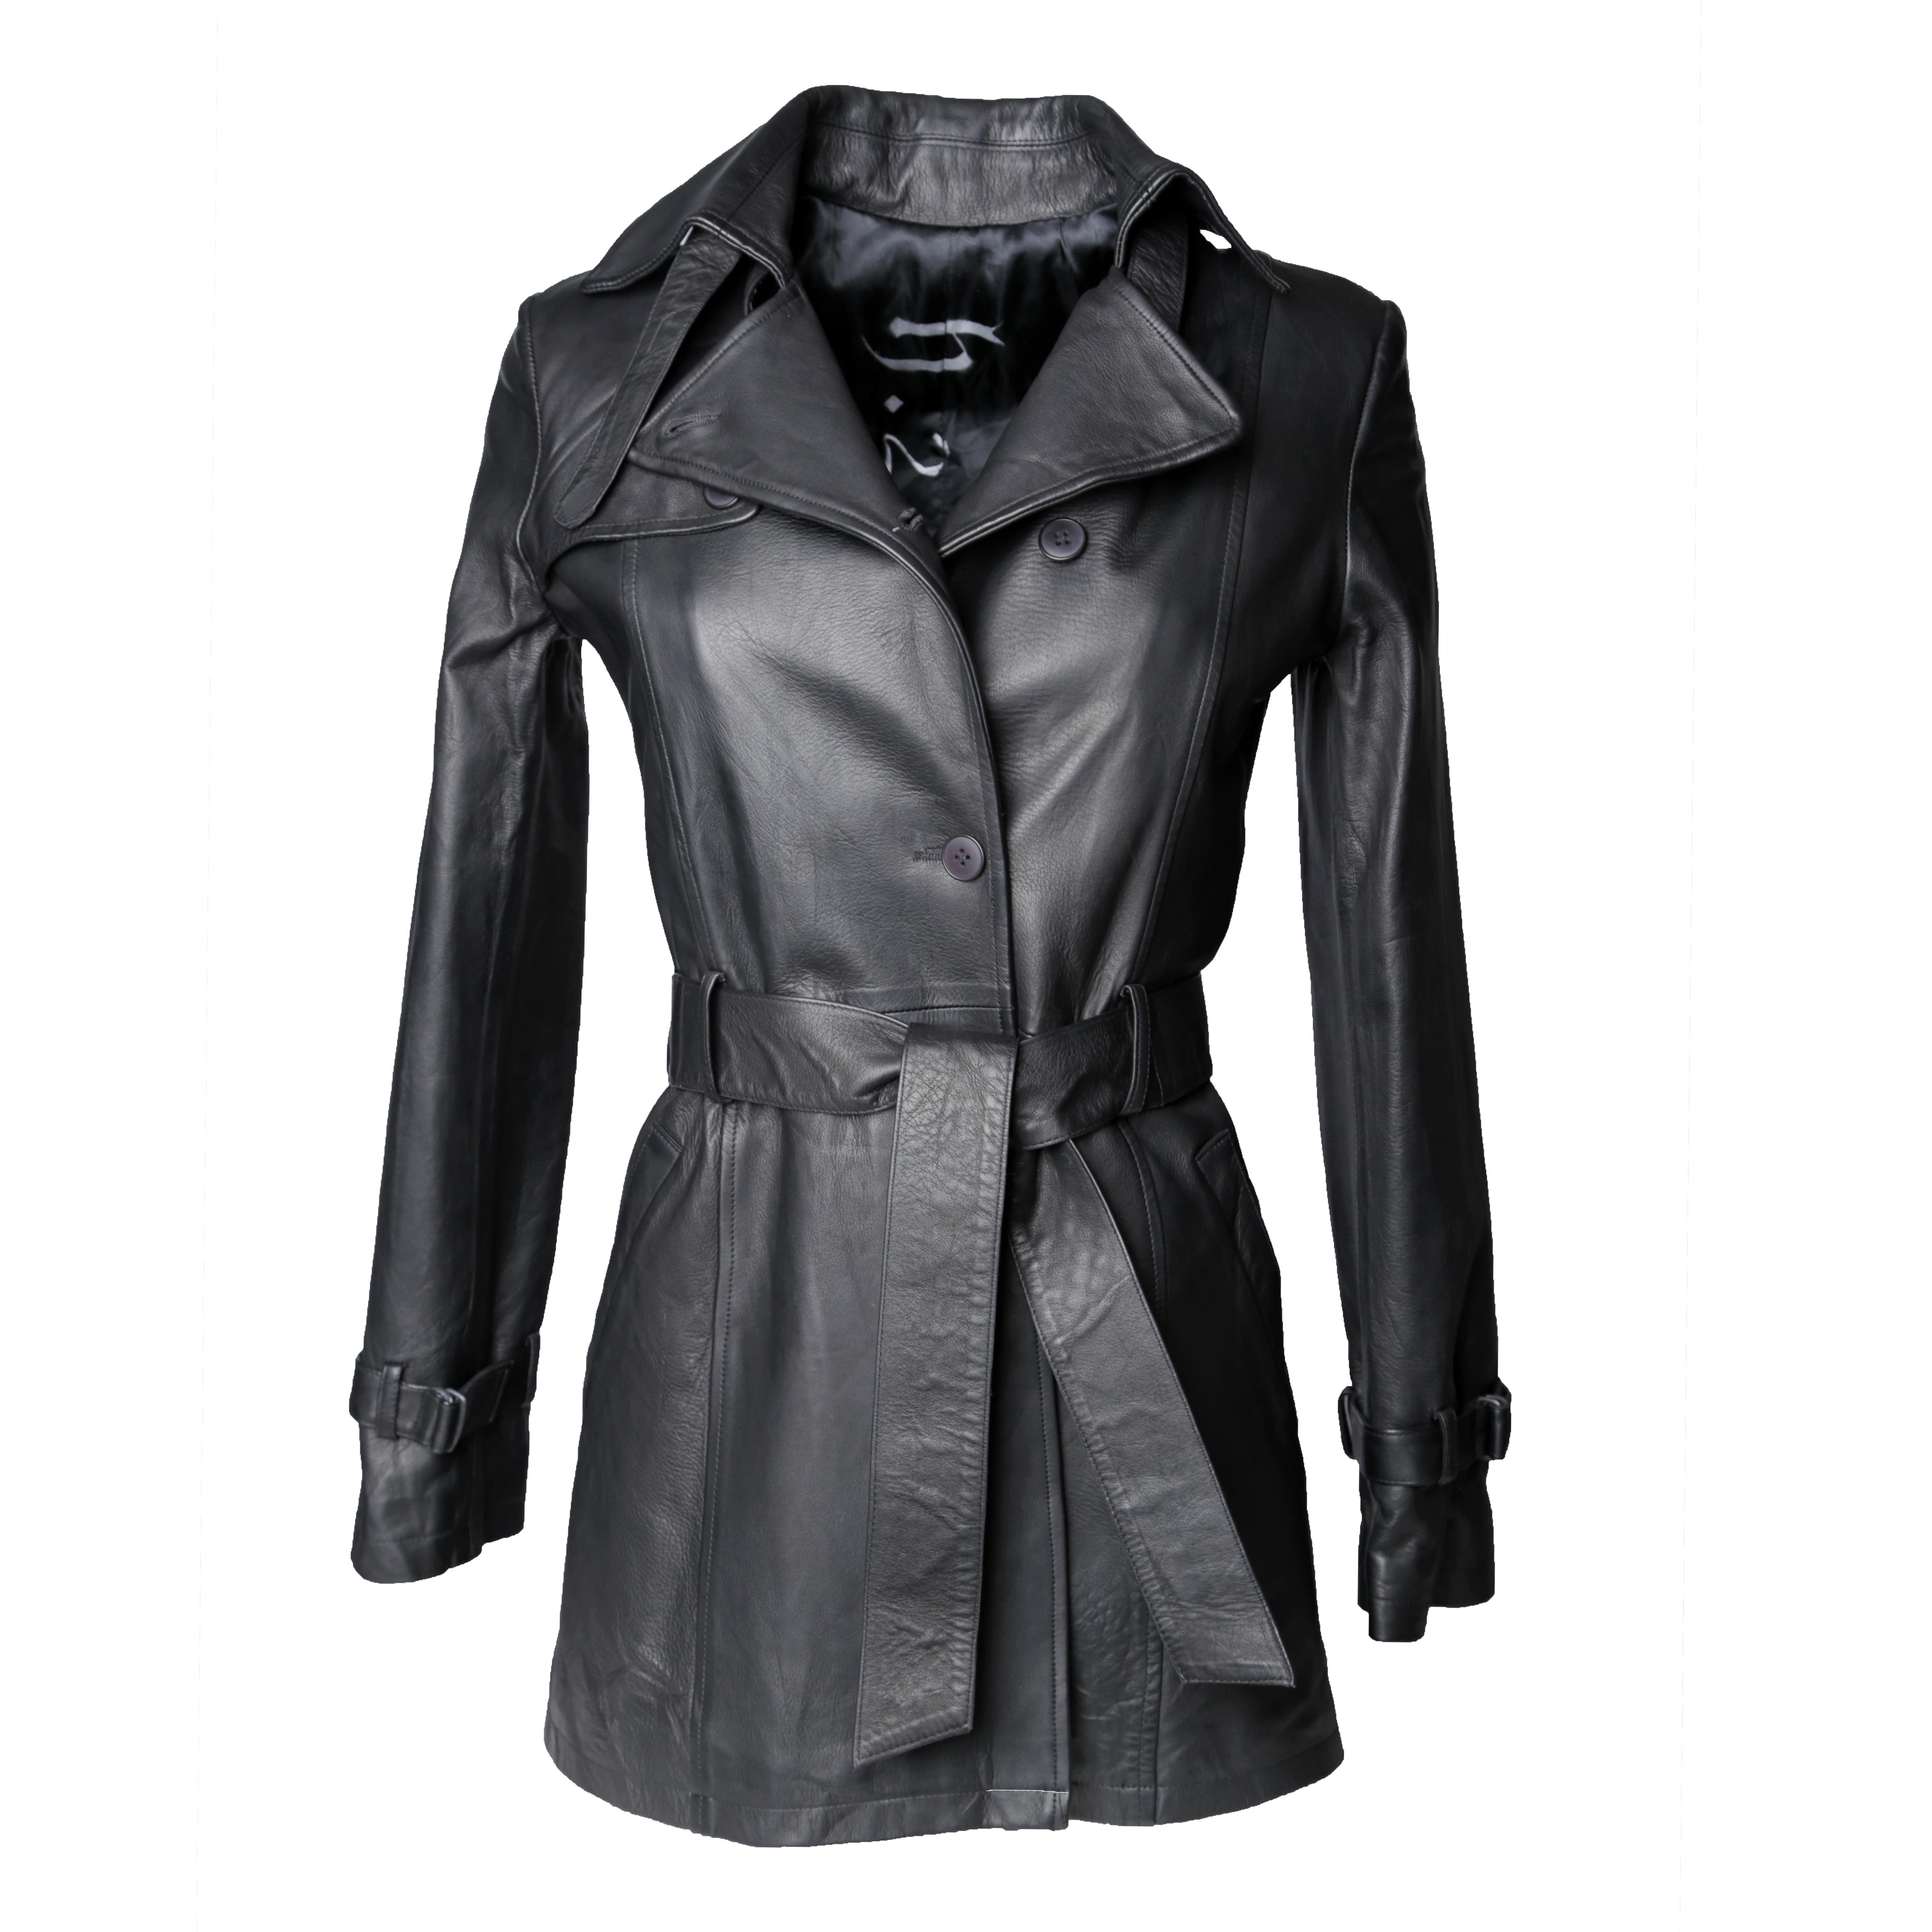 Nova cuir noir - 389€